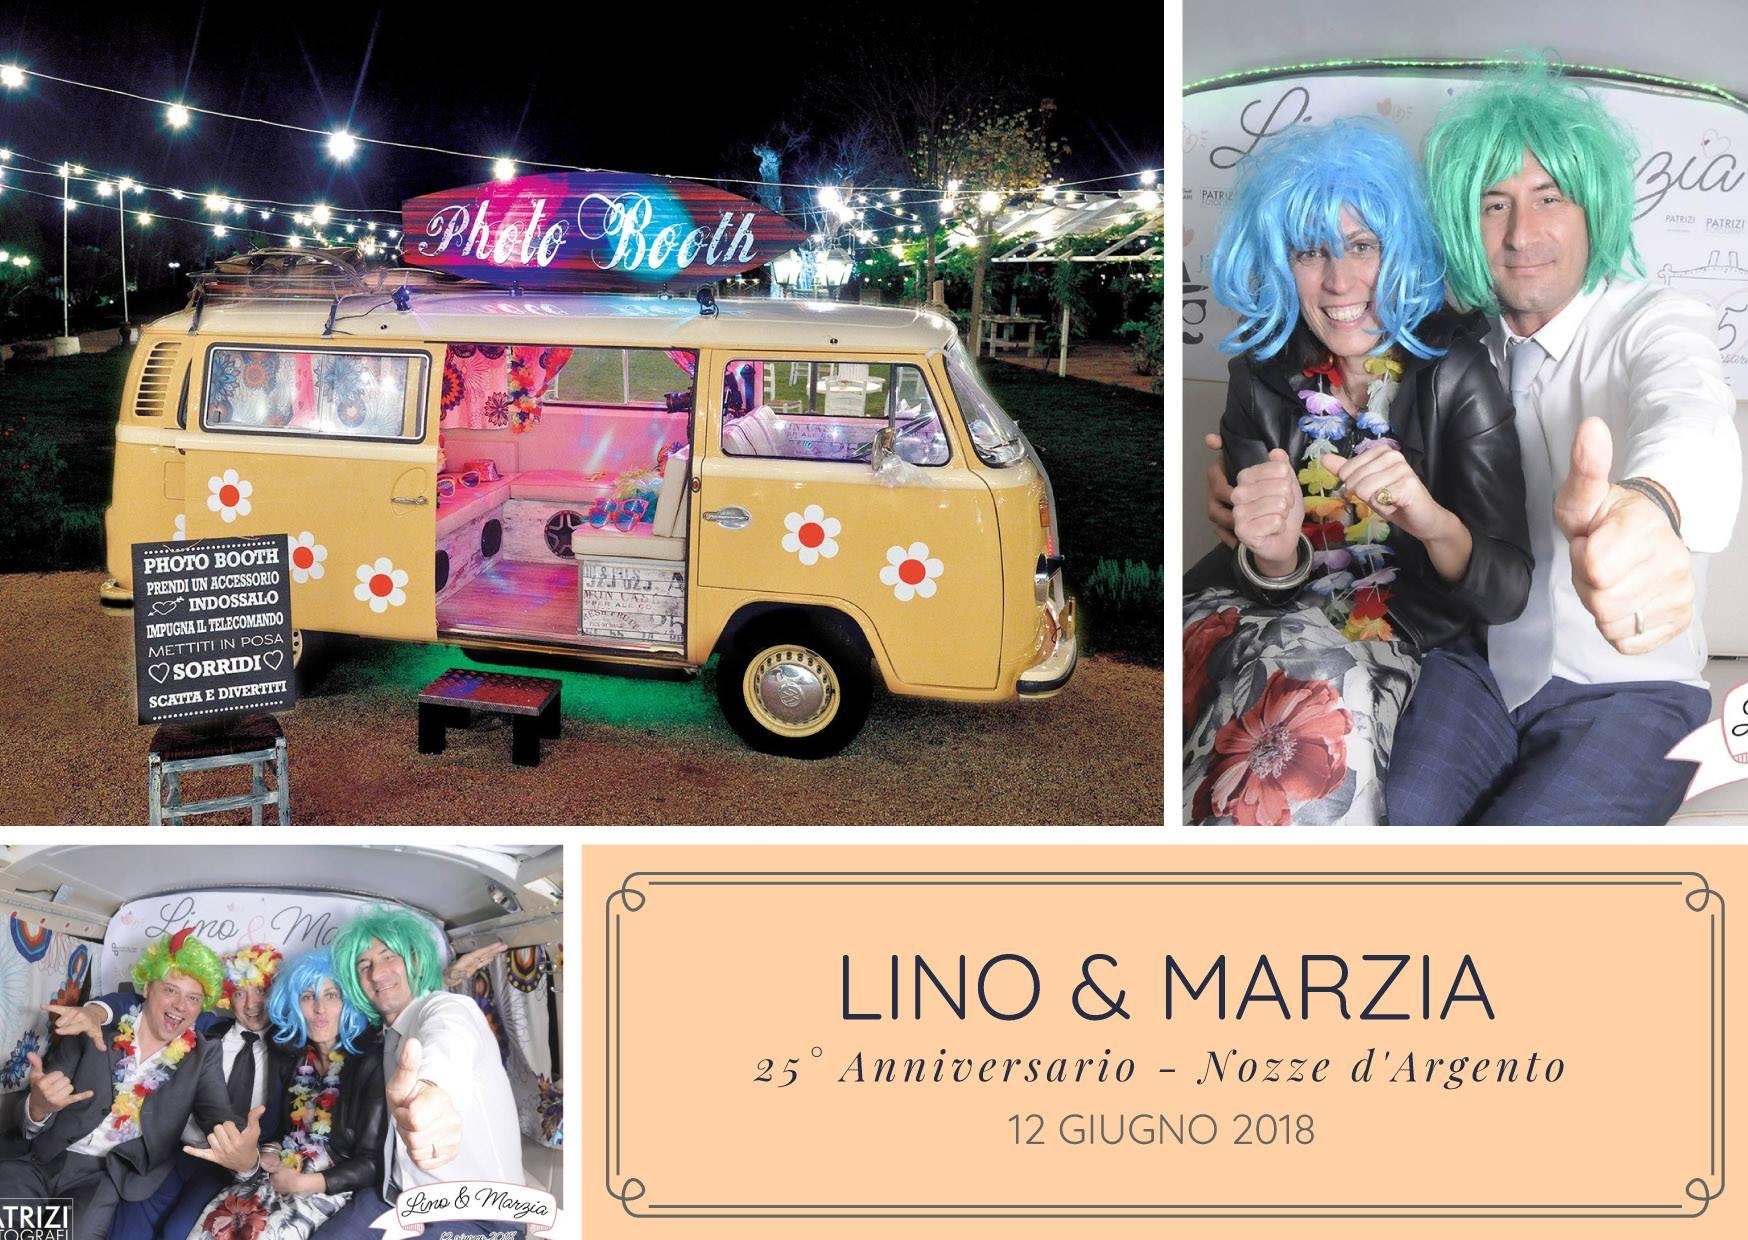 patrizi-fotografi-matrimoni-pulmino-photobooth-lino-e-marzia-1